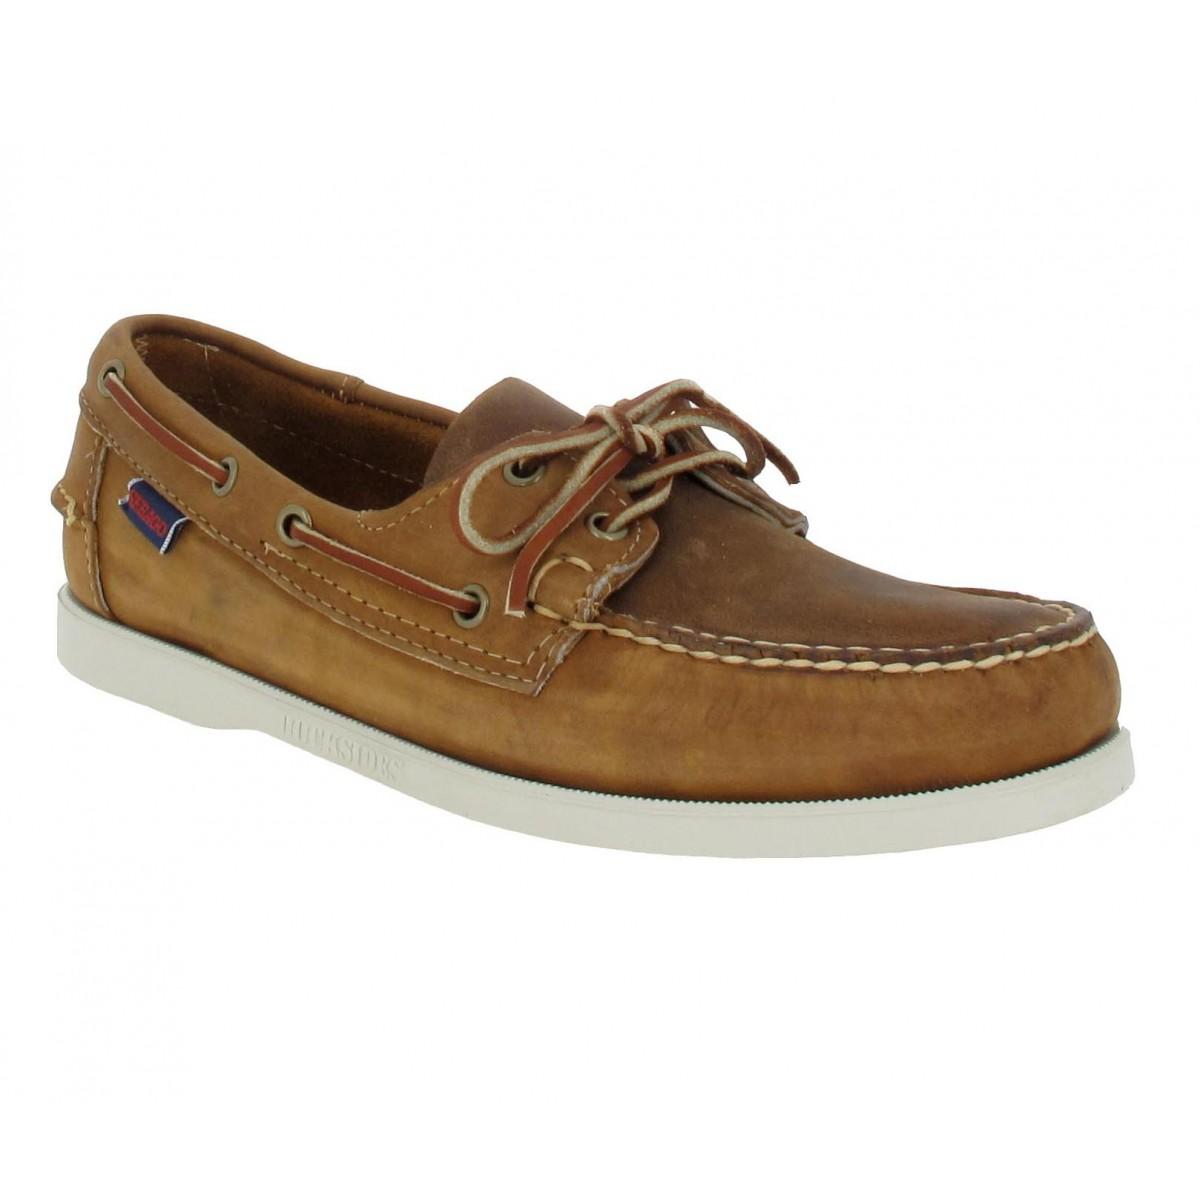 Chaussures bateaux SEBAGO Docksides cuir Homme Brun